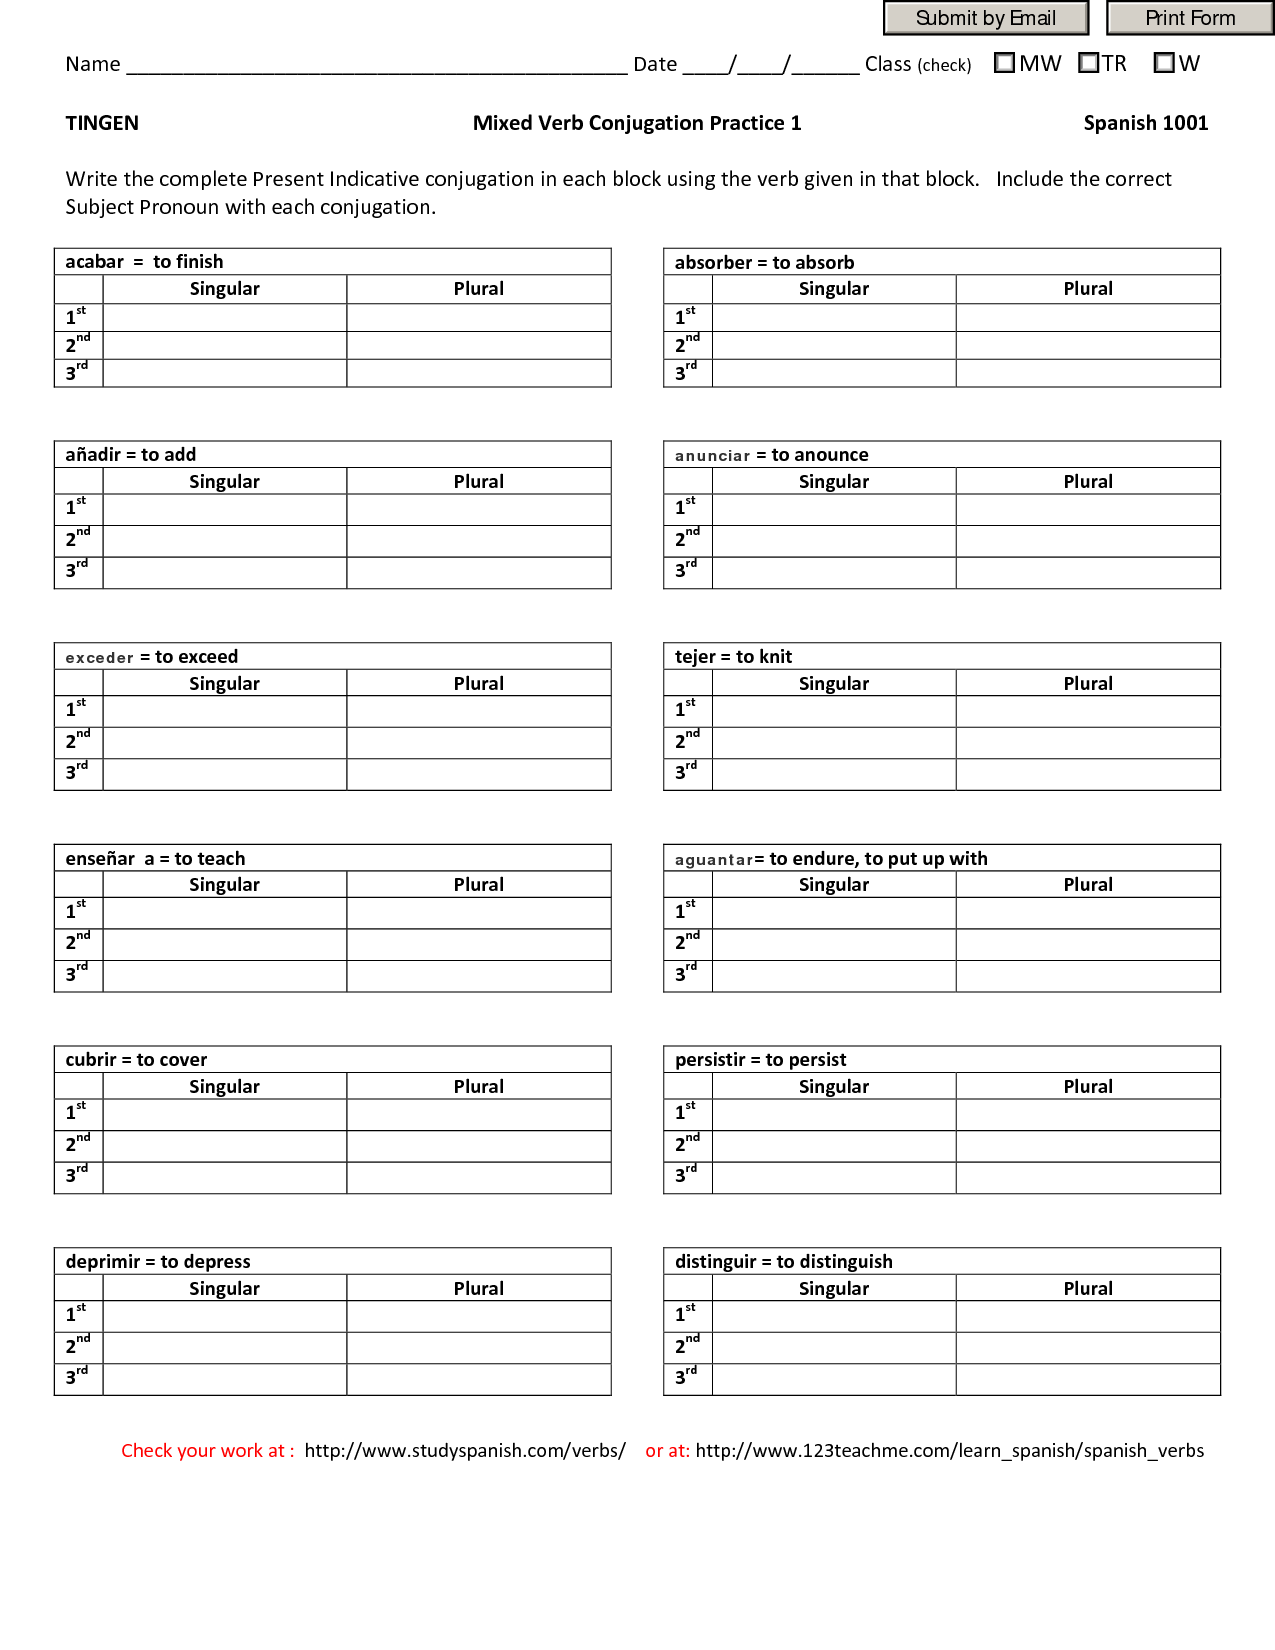 Cozy 18 Best Images Of Spanish Conjugation Worksheets